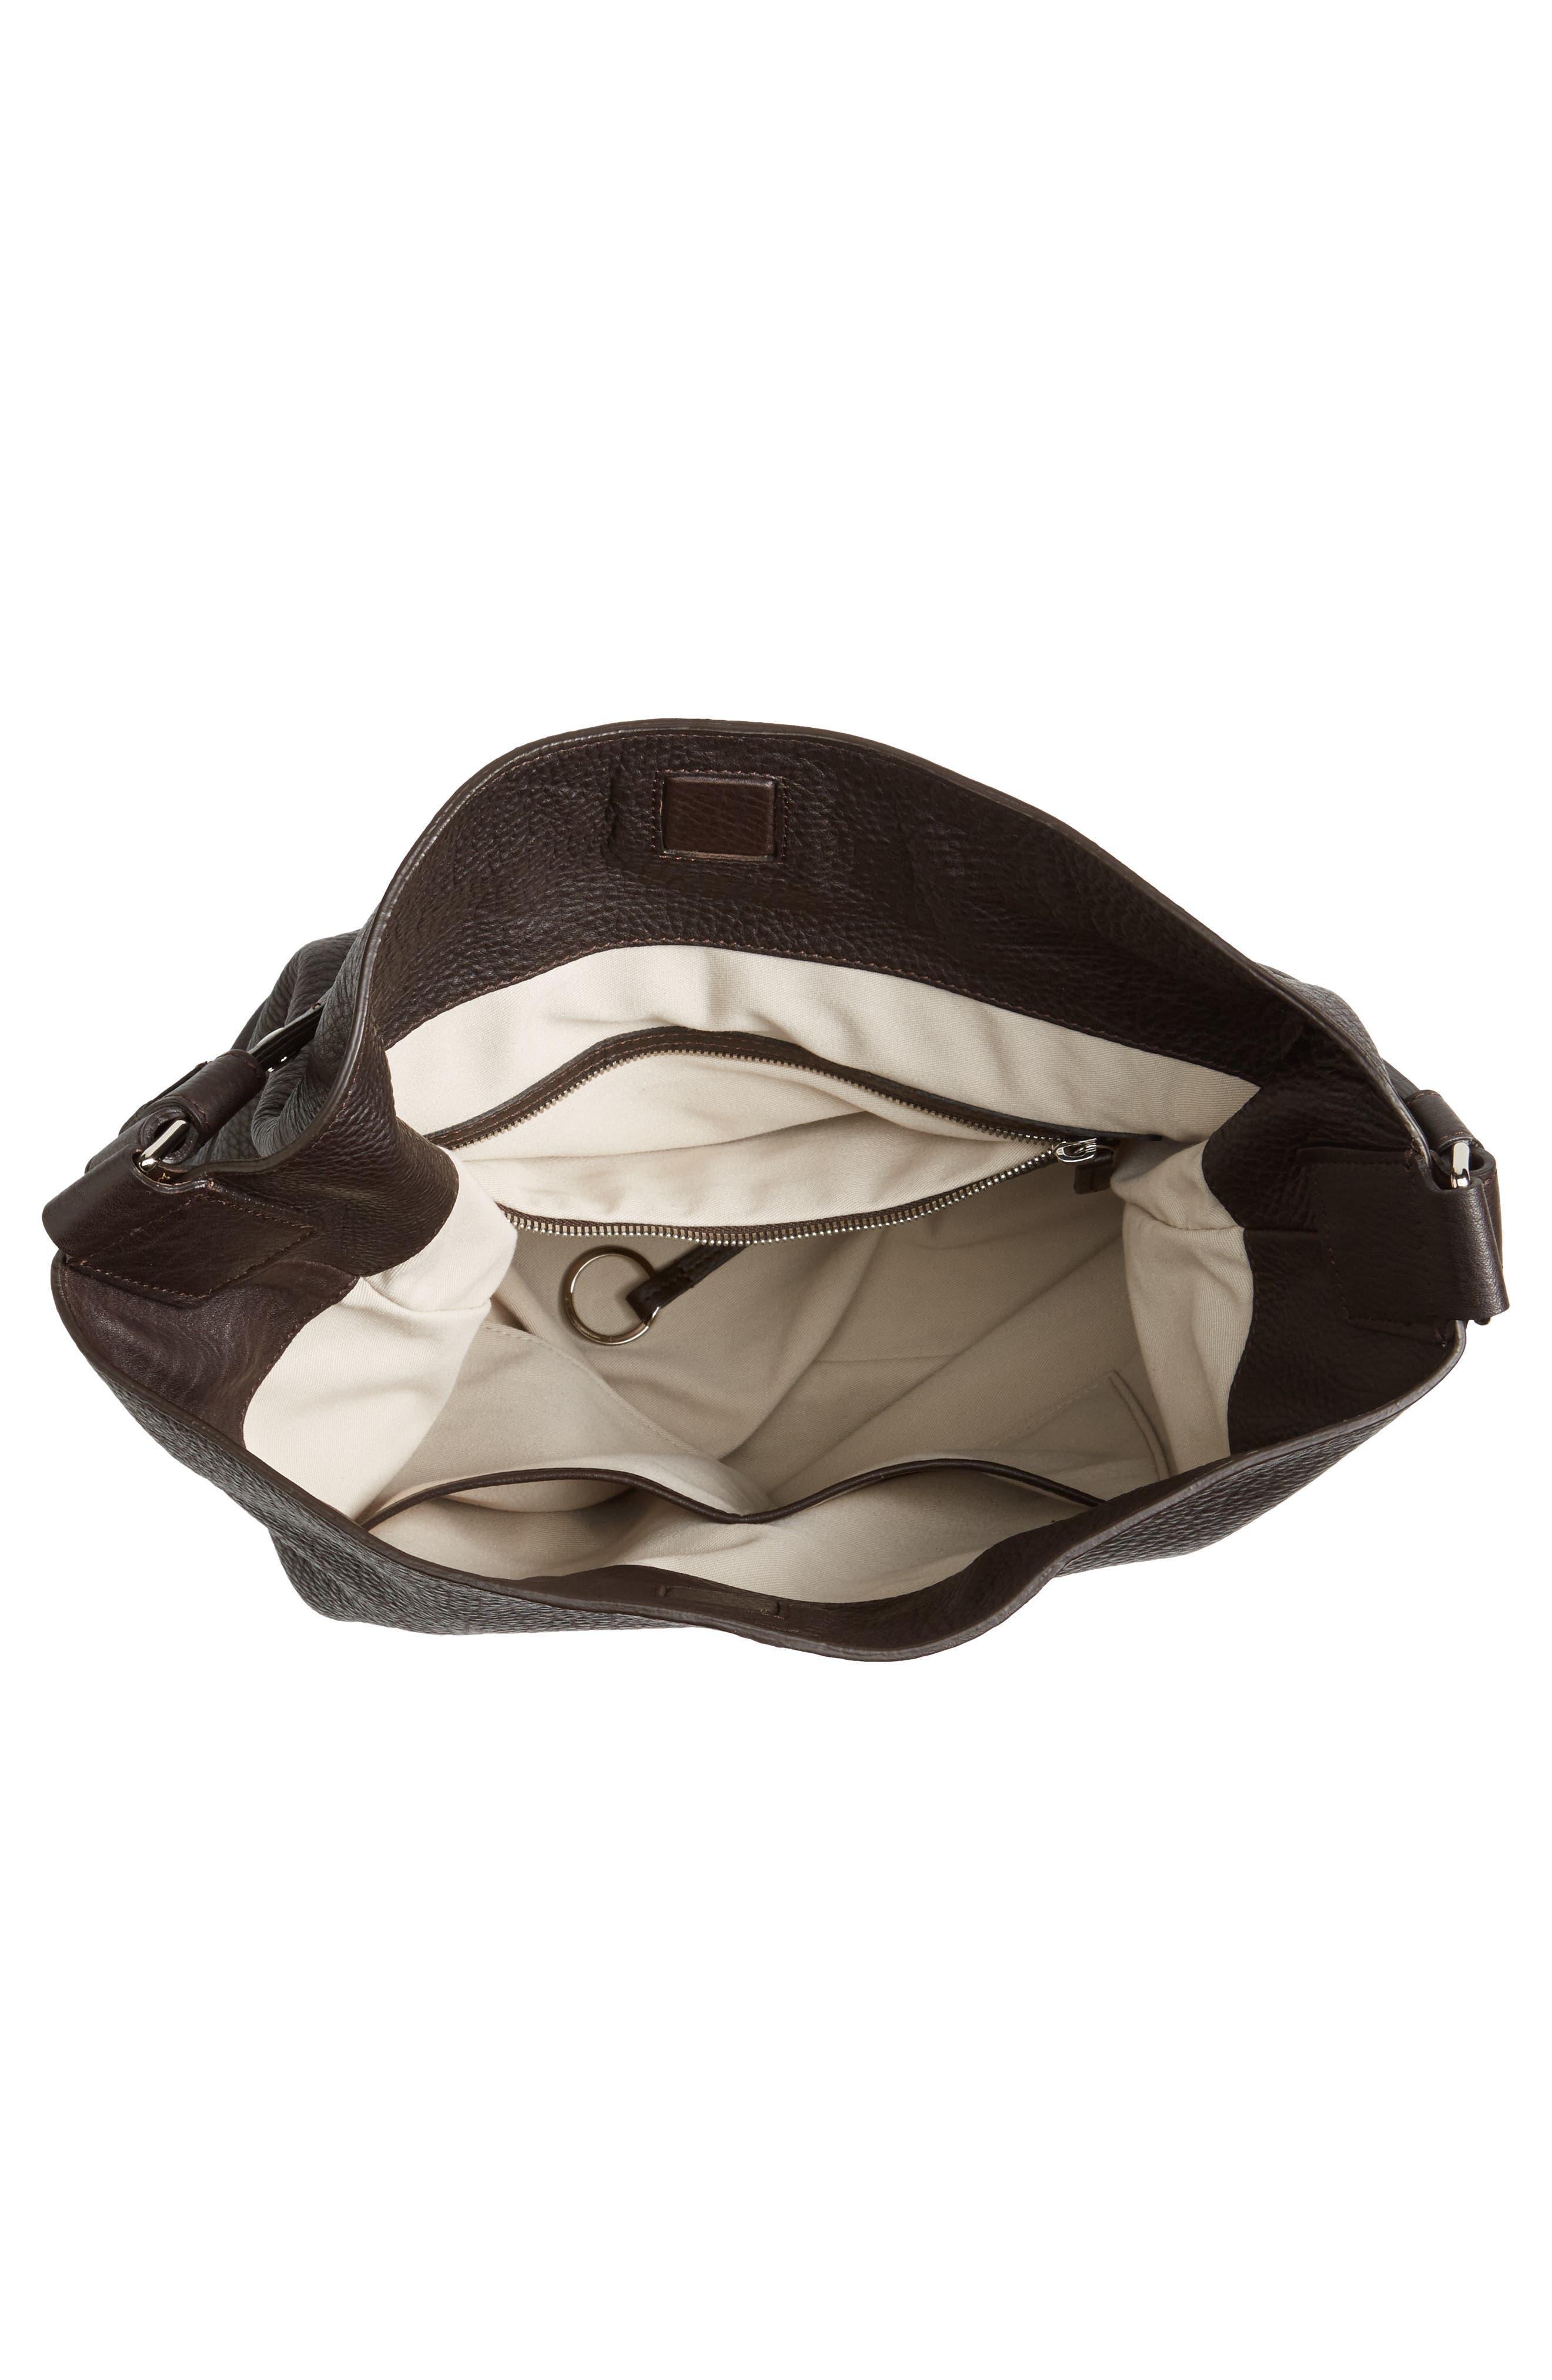 Relaxed Calfskin Leather Hobo Bag,                             Alternate thumbnail 4, color,                             240